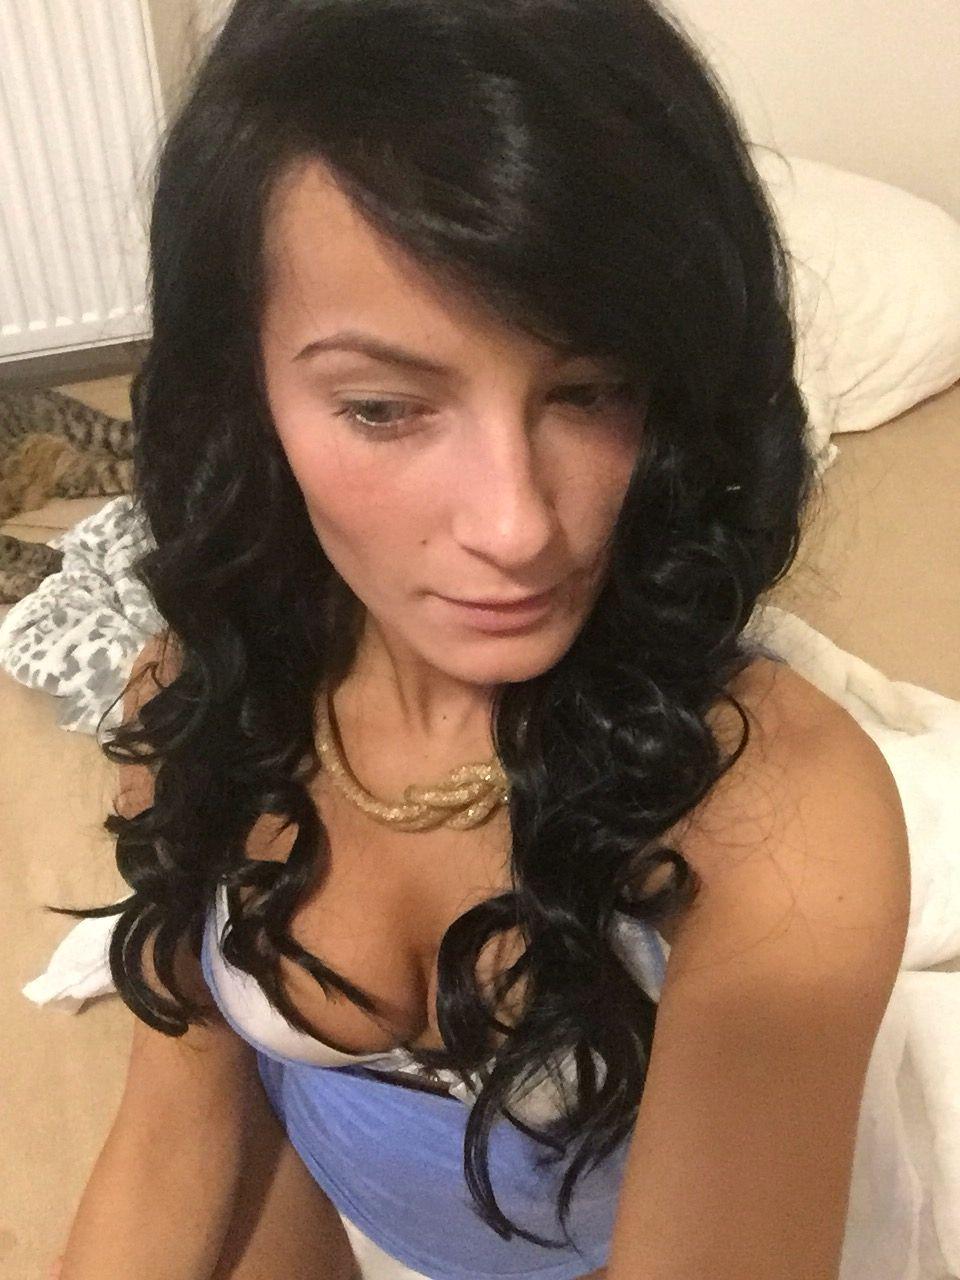 Lexidona i love to masturbate on my bed and film it - 1 part 2